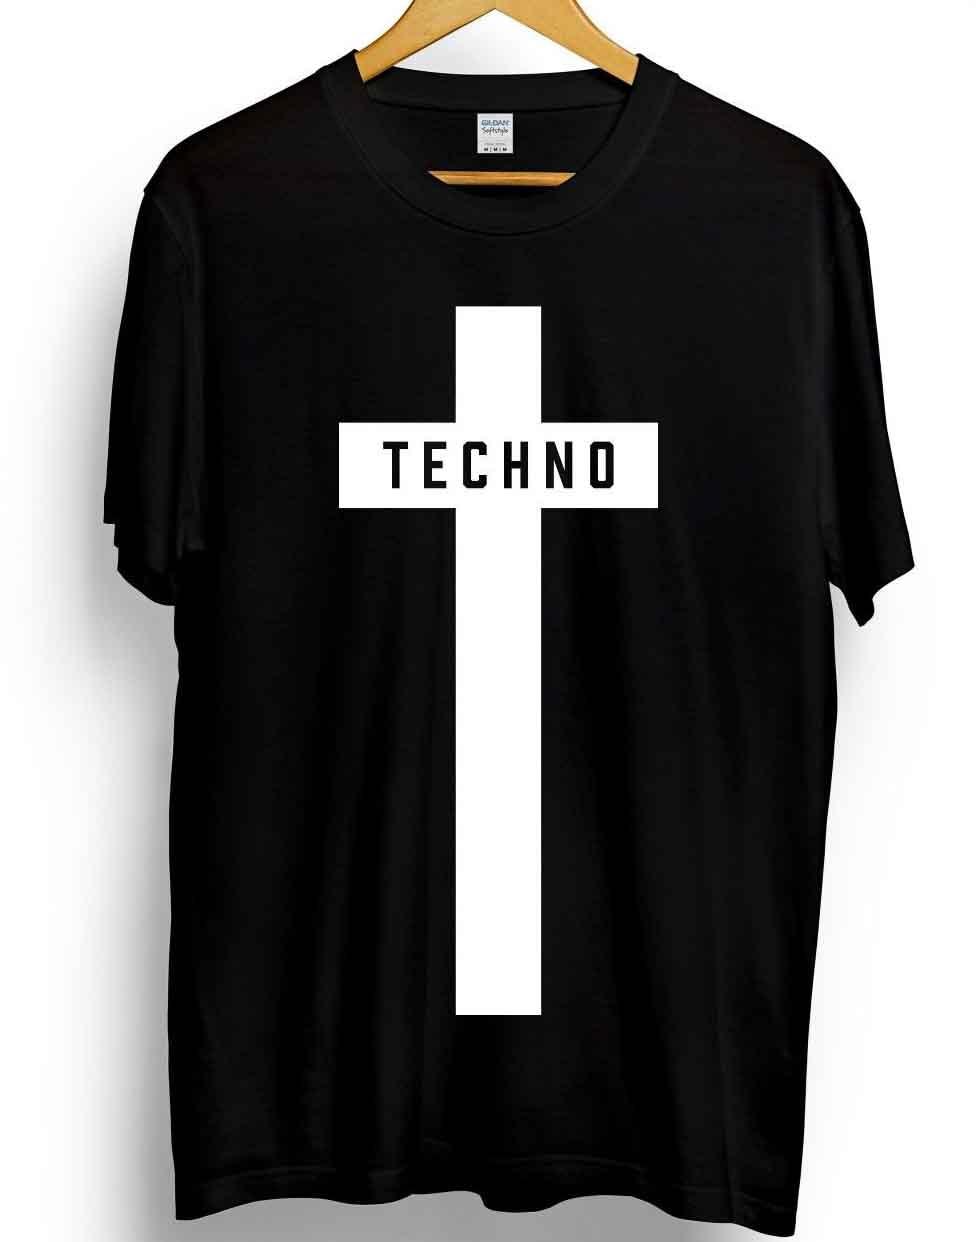 Techno Cross Printed T-Shirt